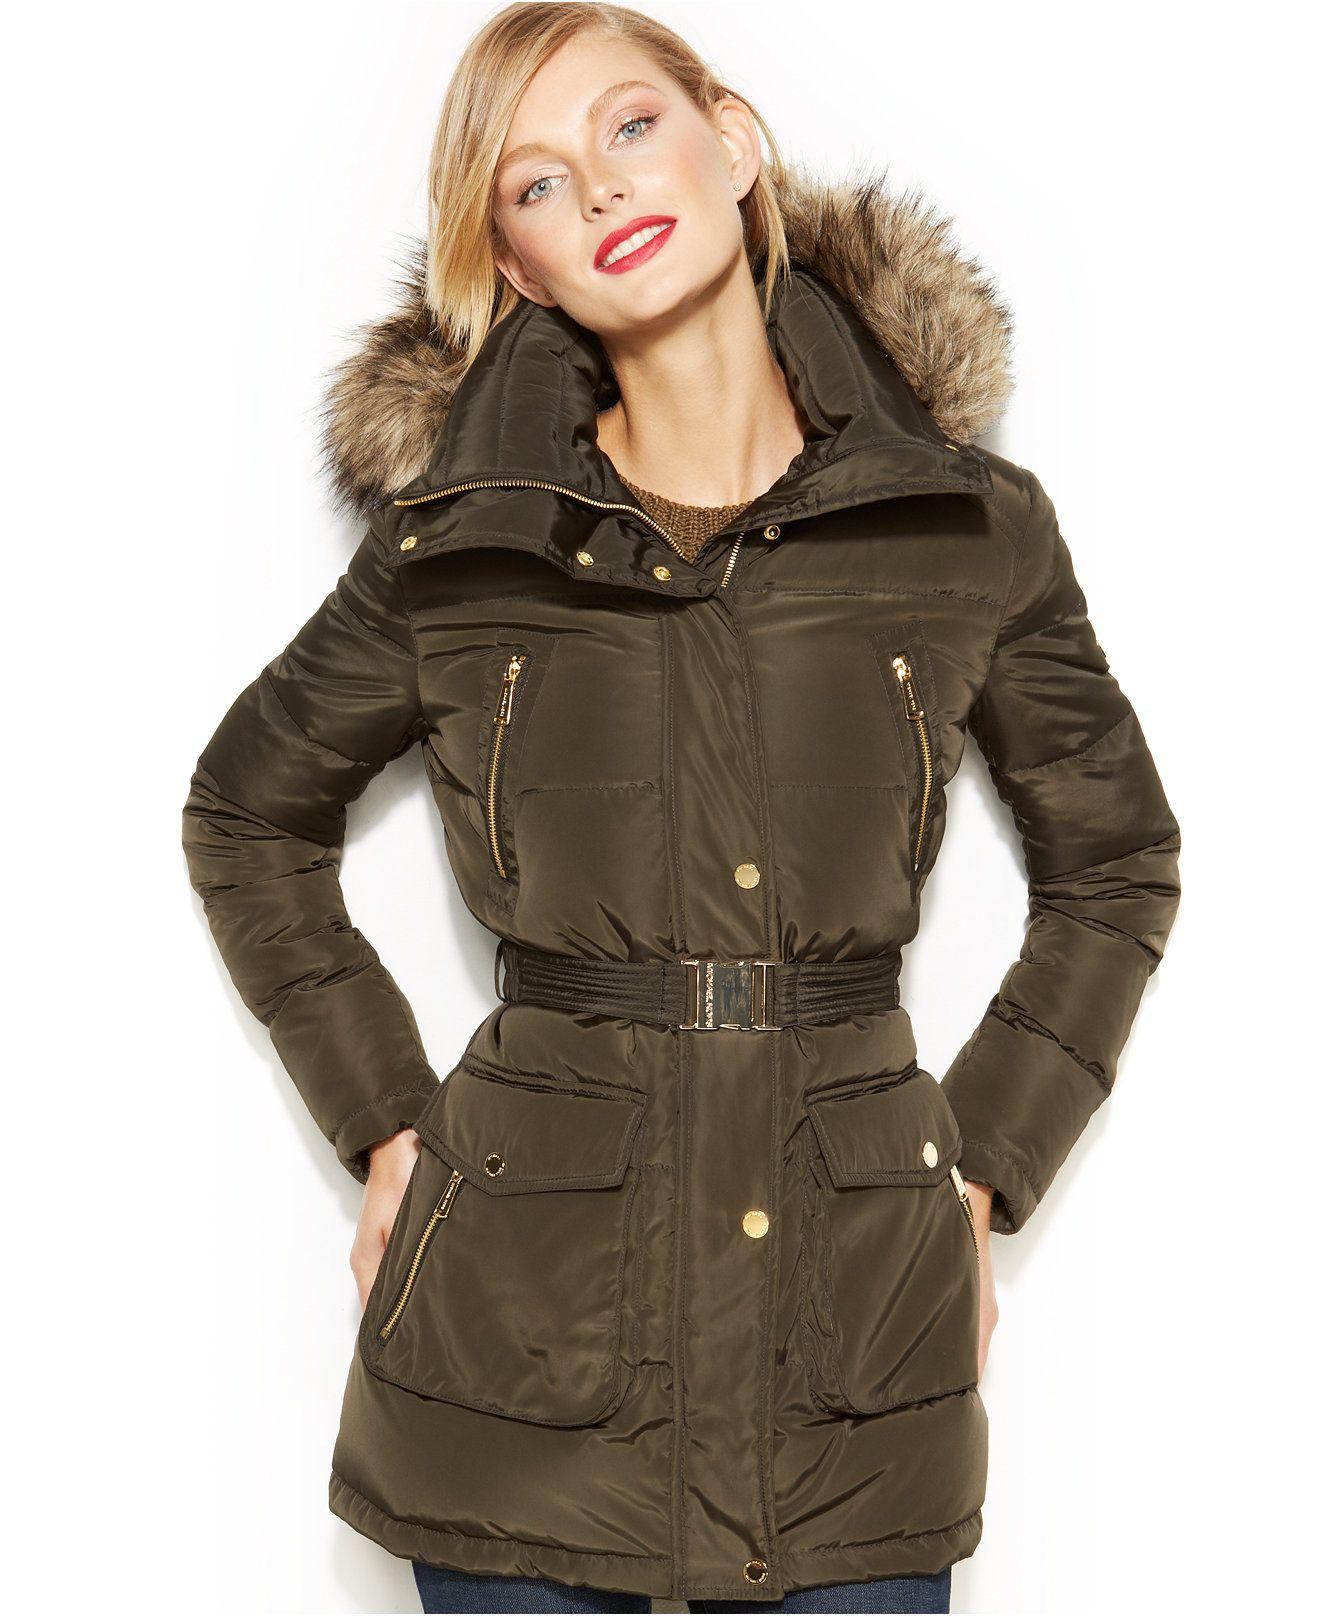 e368d58e6d39e MICHAEL Michael Kors Hooded Faux-Fur-Trim Down Puffer Coat - Coats - Women  - Macy s